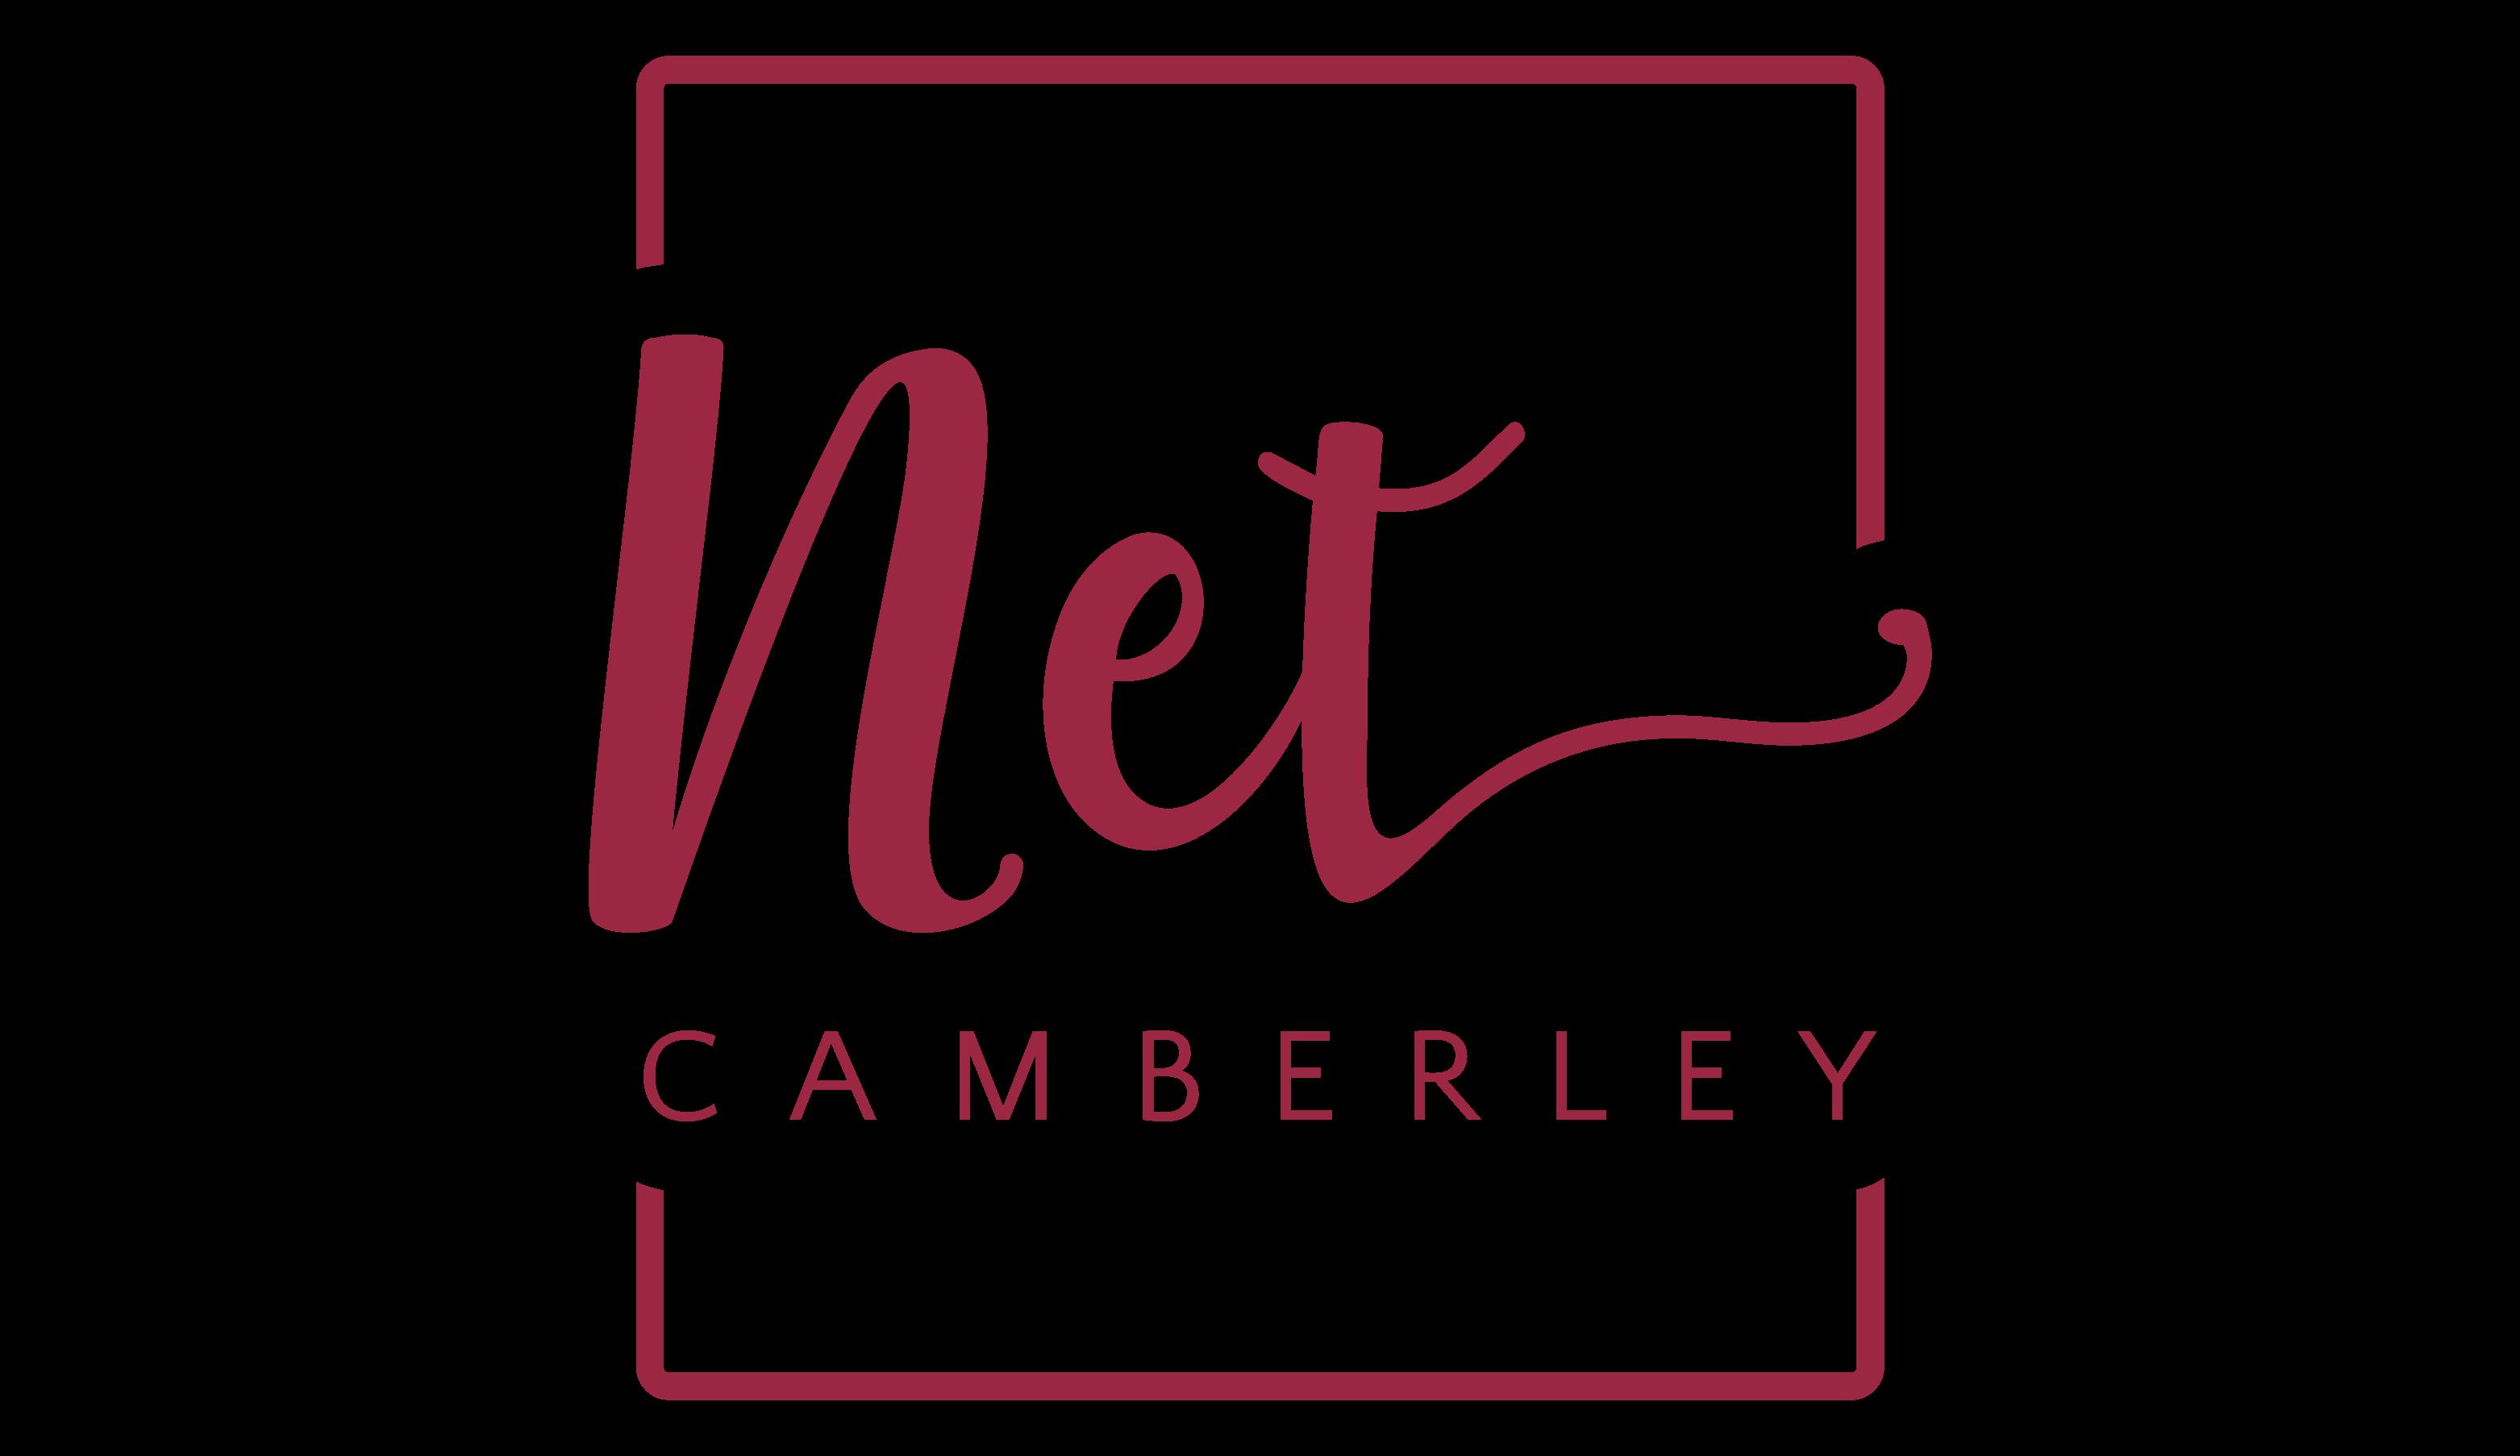 Camberley Net